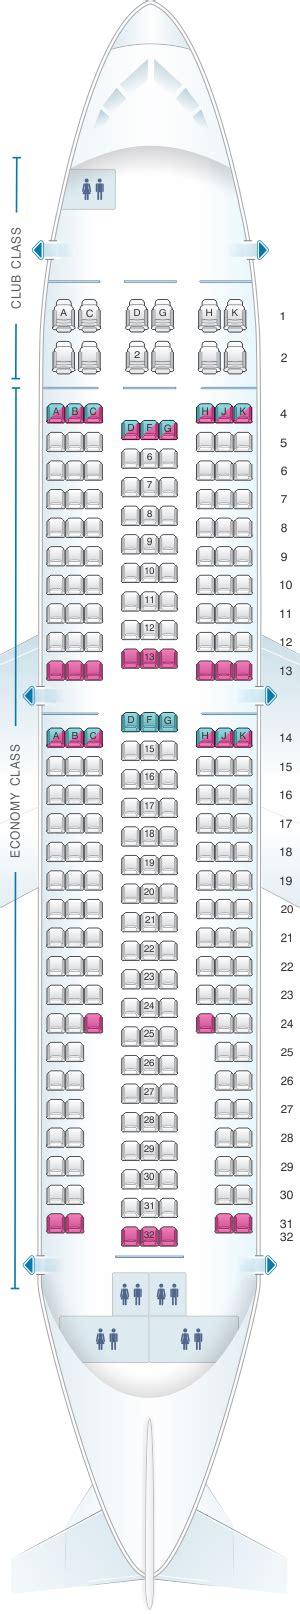 airbus a310 300 seating seat map air transat airbus a310 300 seatmaestro